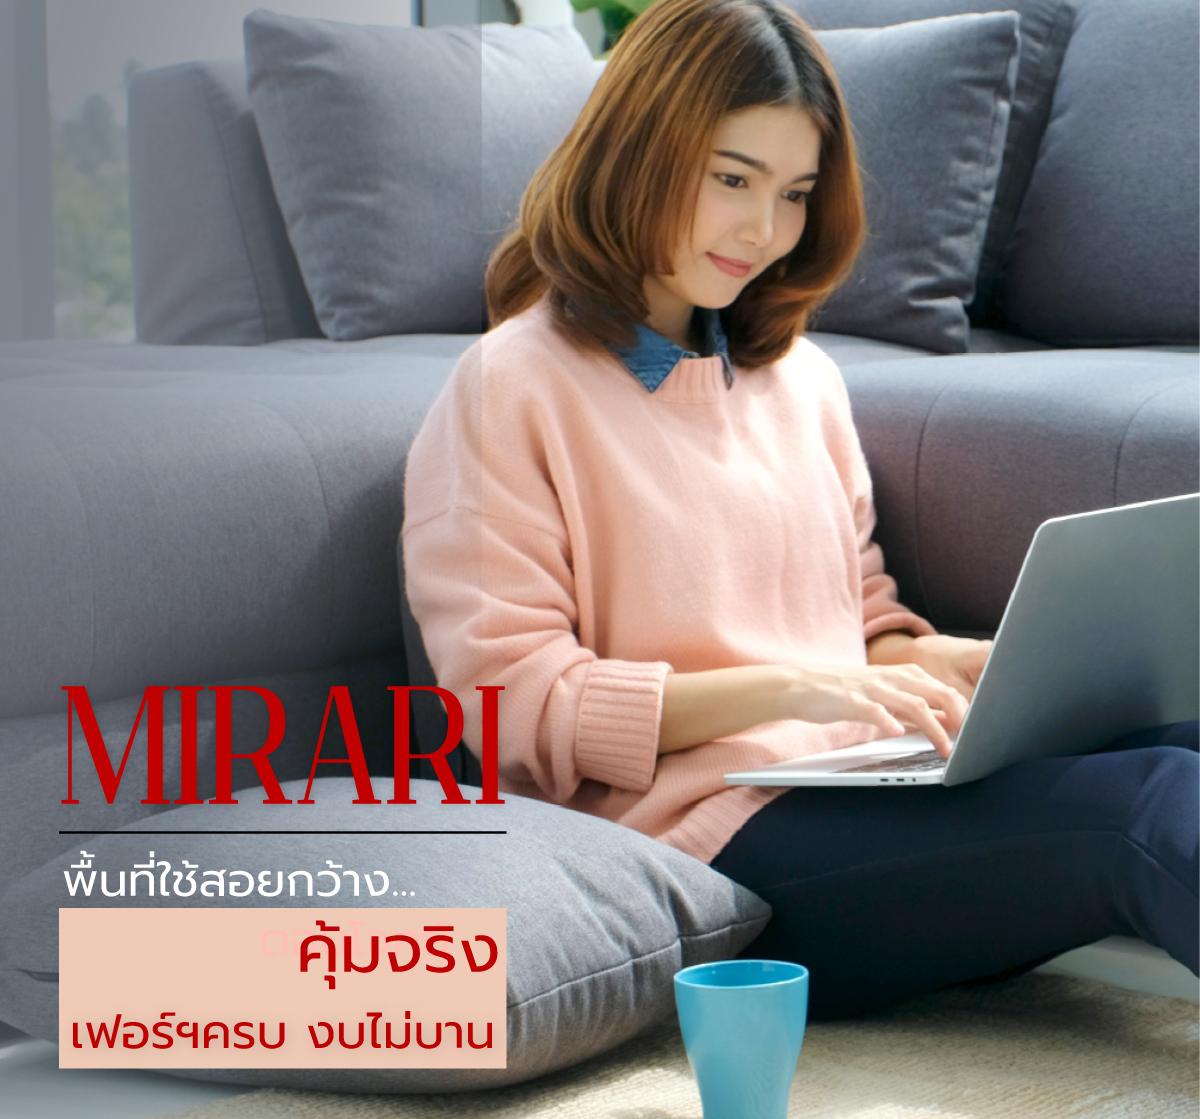 Mirari-Home_Banner-03_EDIT-16-Aug